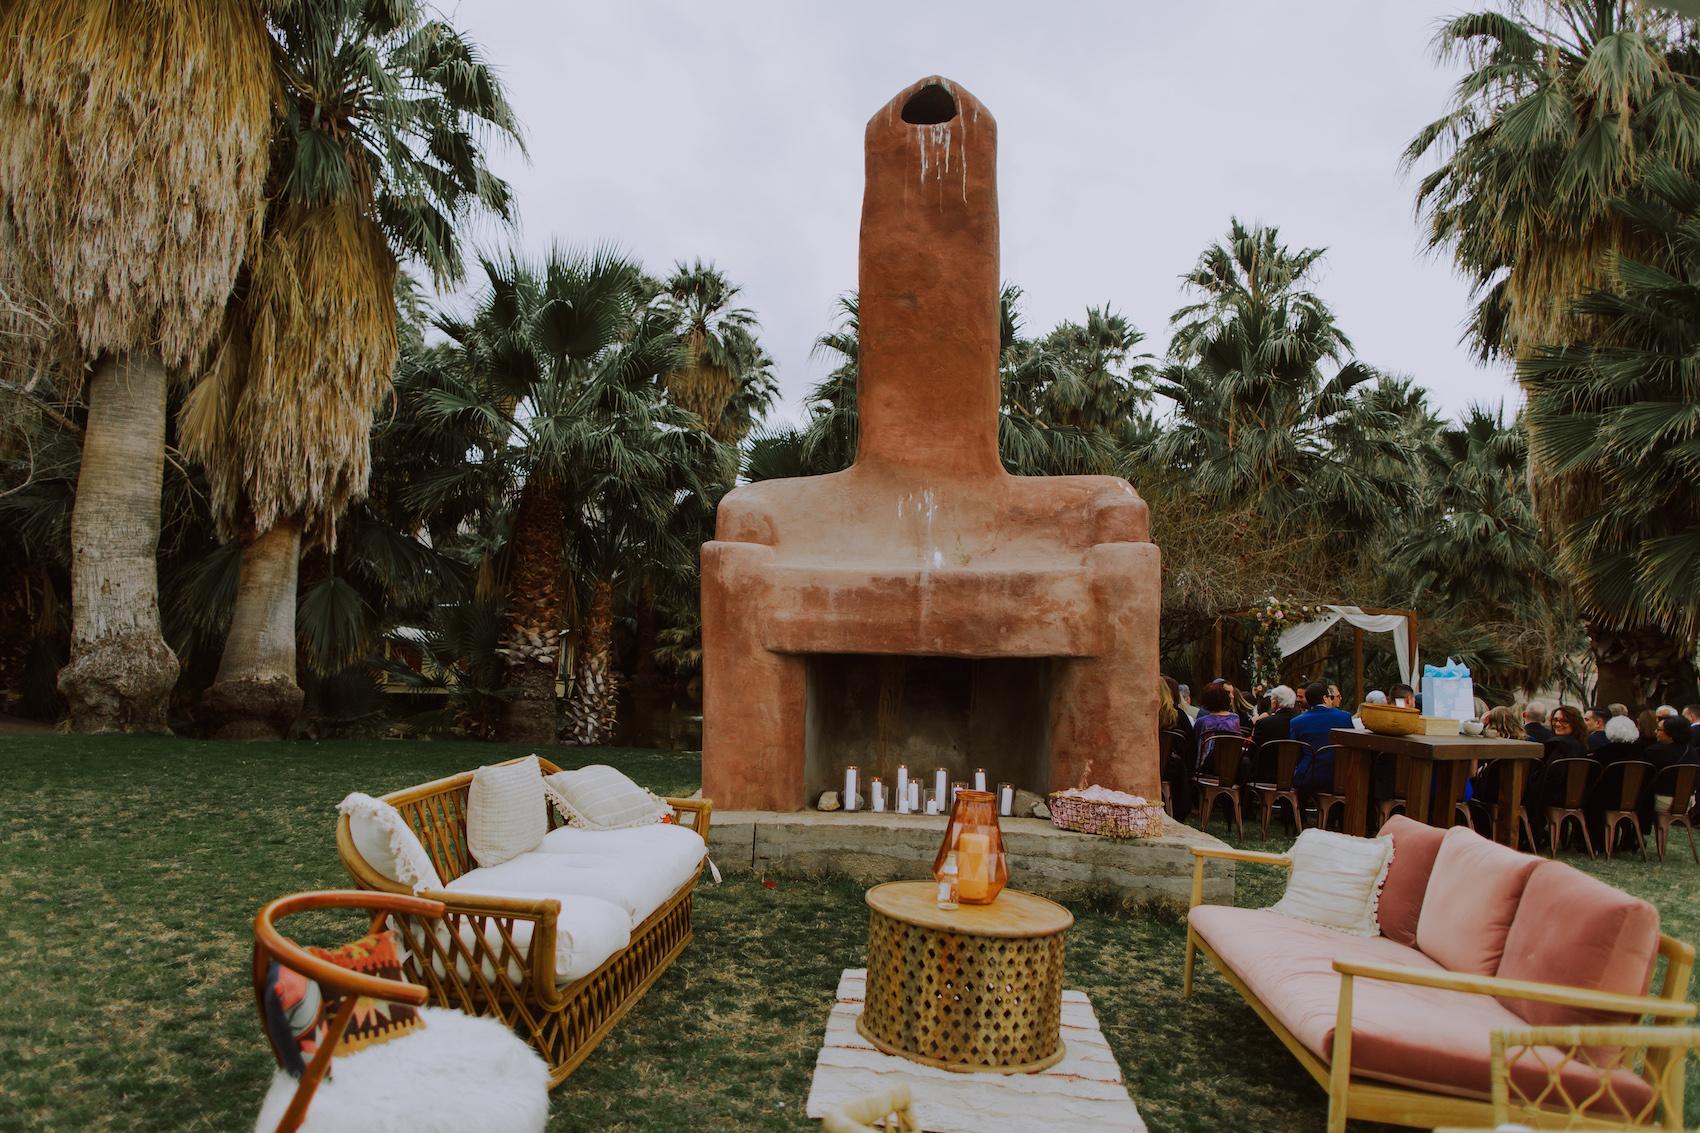 29-Palms-Inn-Joshua-Tree-Jewish-Wedding-H+M-40.jpg